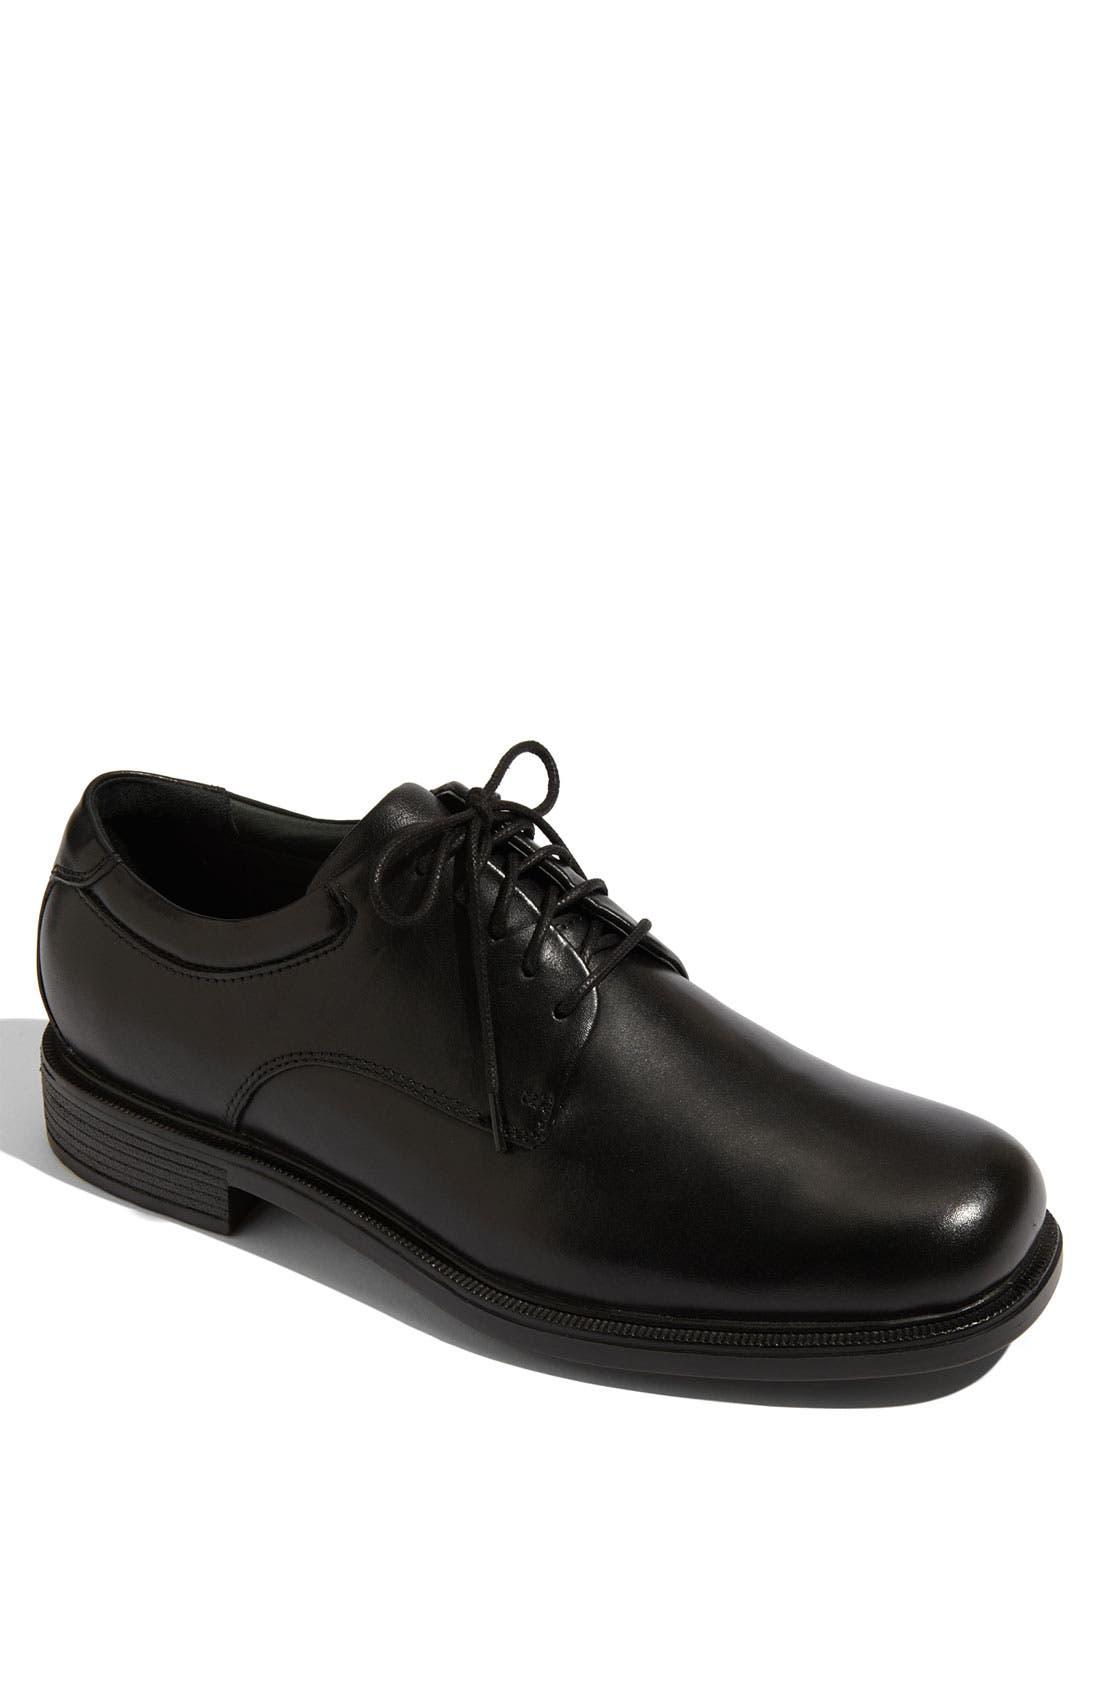 'Margin' Oxford,                         Main,                         color, BLACK LEATHER